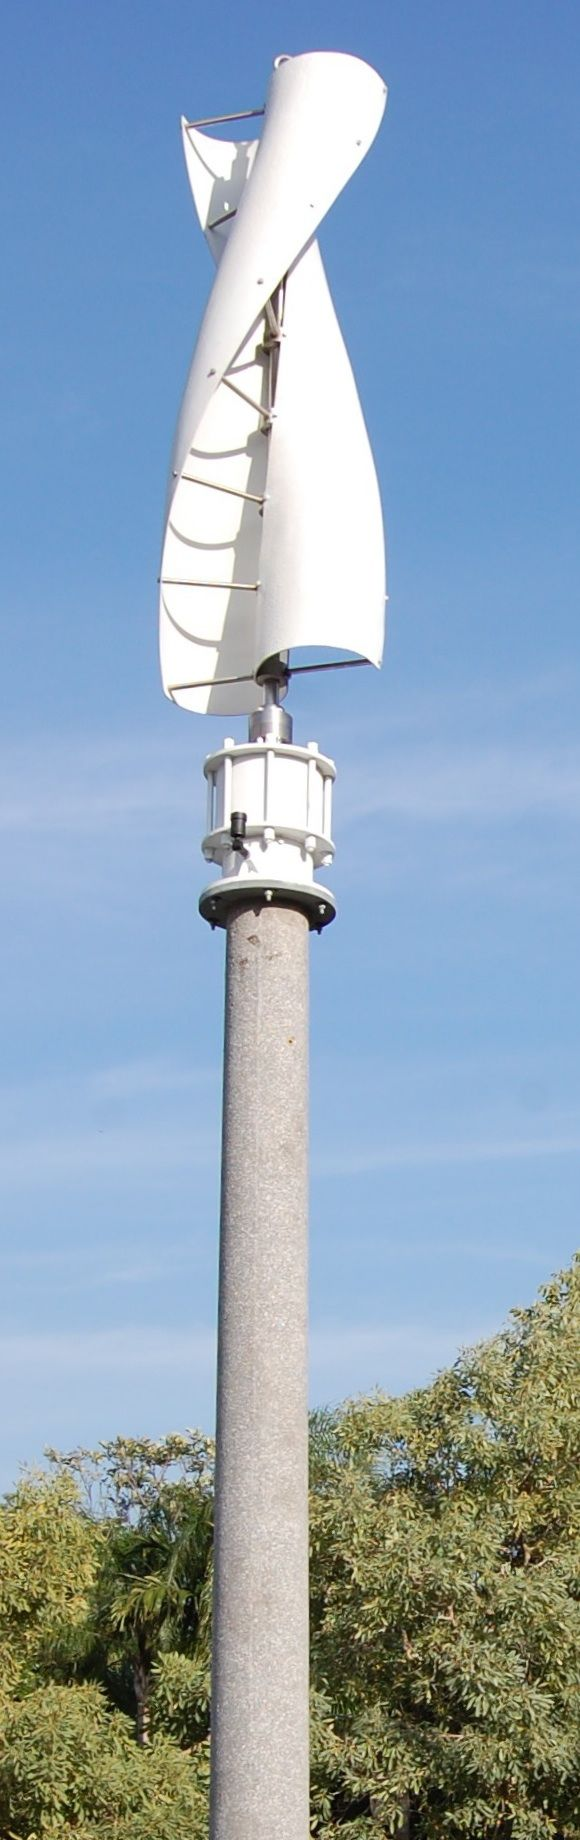 vertical wind turbine - Google Search